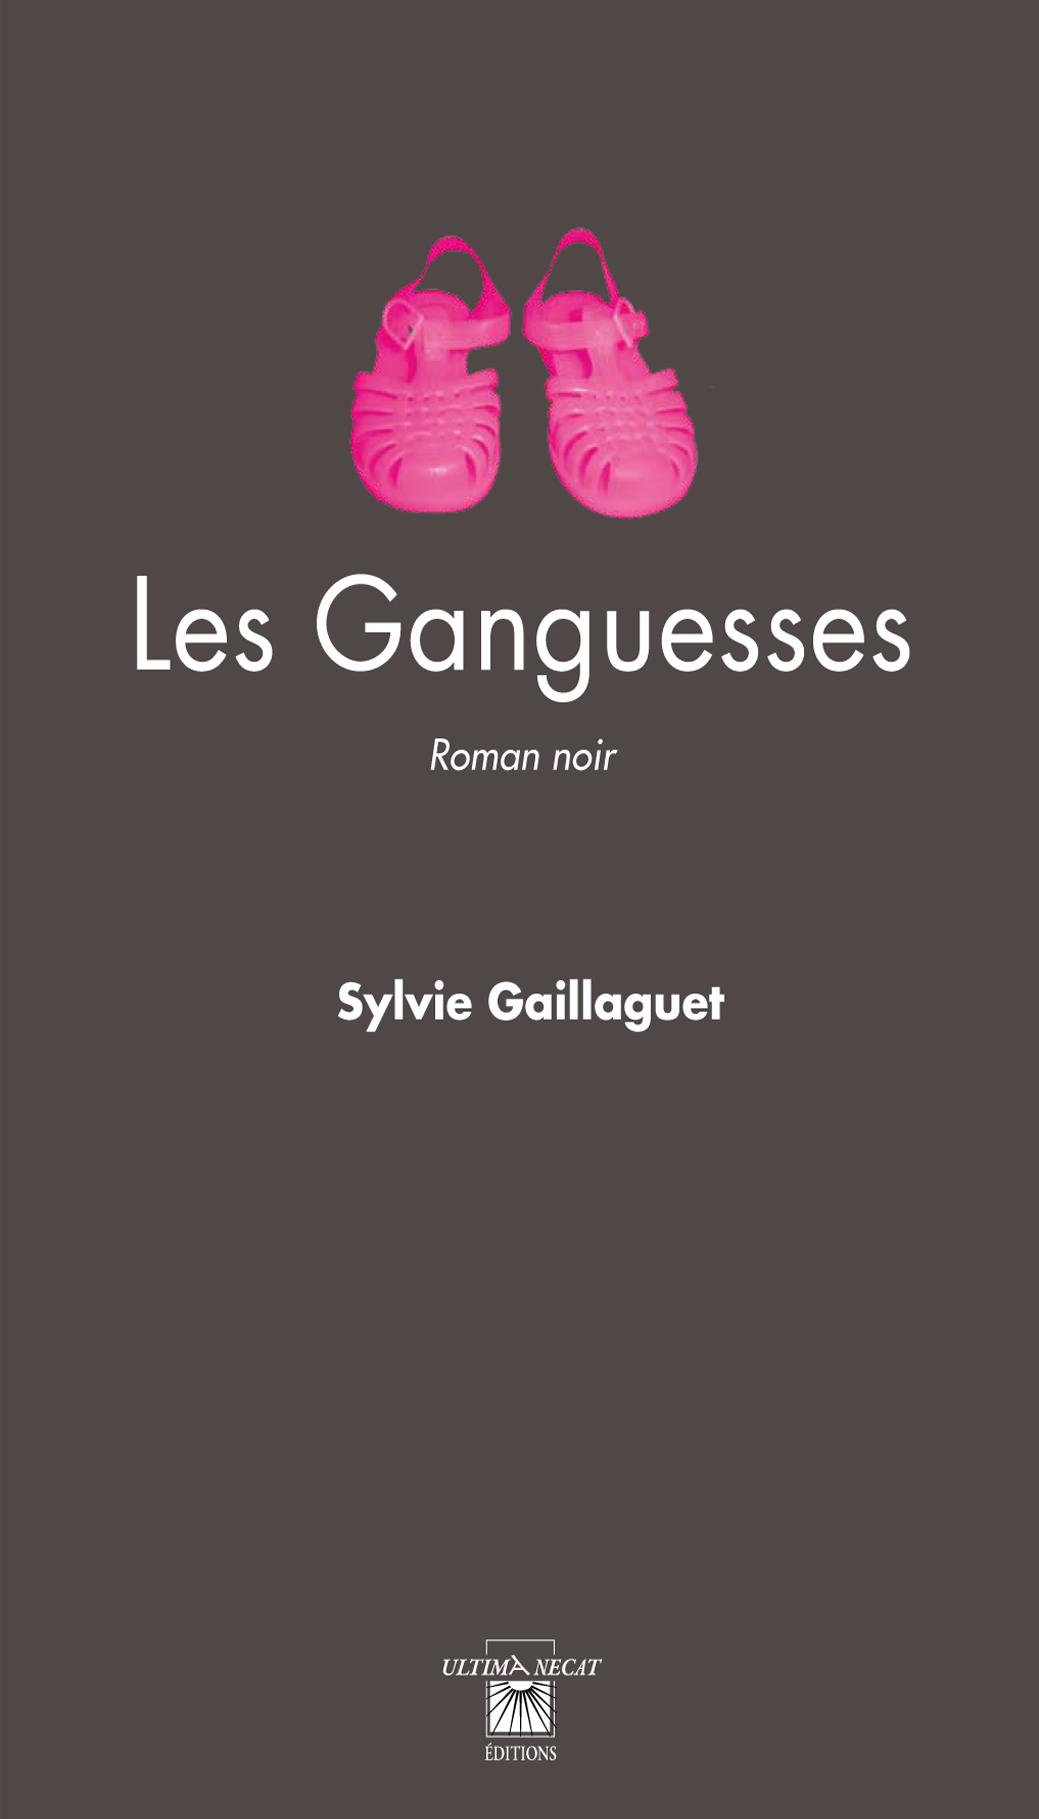 Les Ganguesses. Sylvie Gaillaguet.